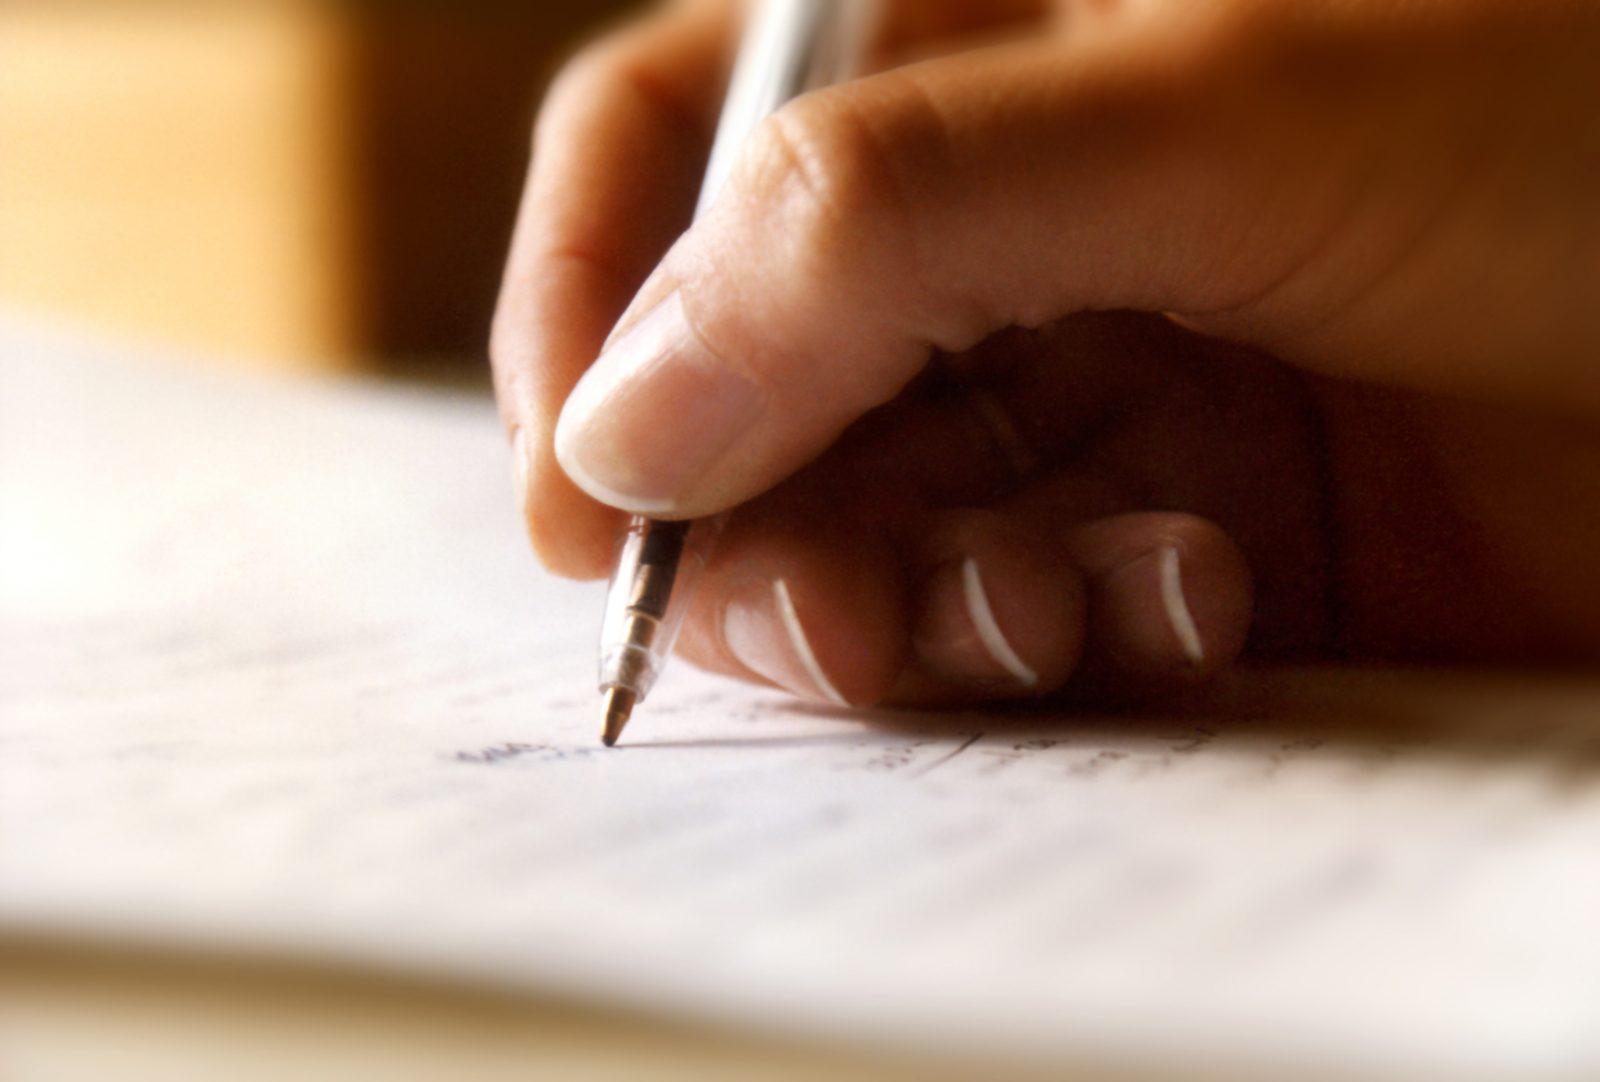 Dominant Management Philosophy of Whirlpool Corporation Essay